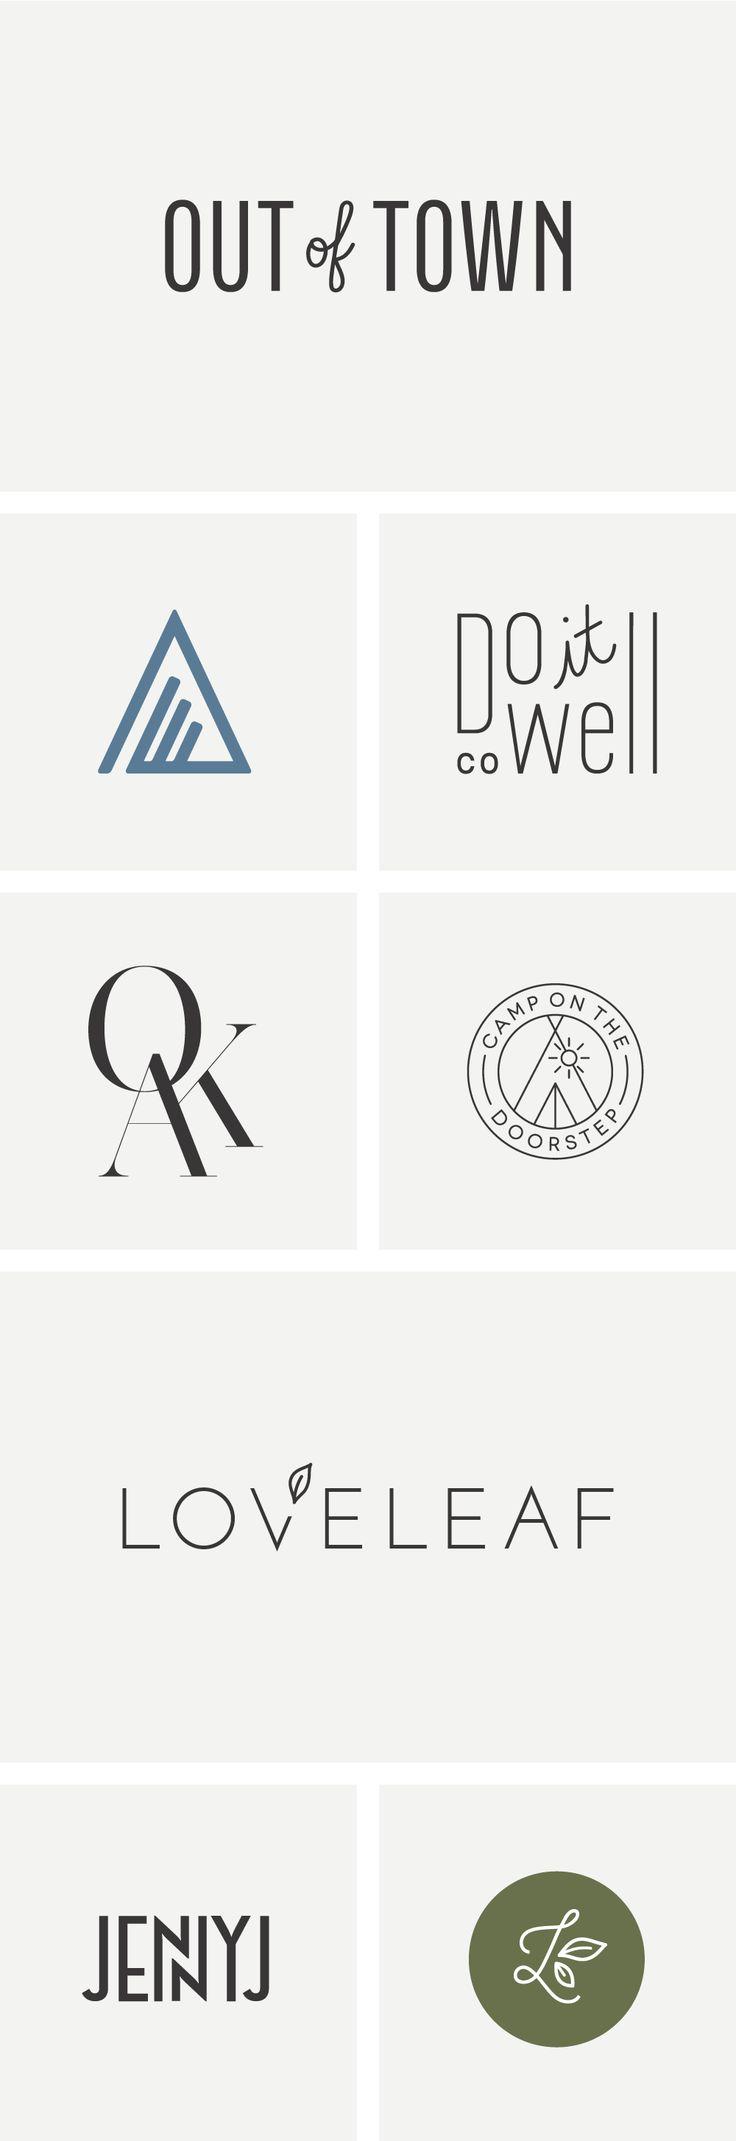 Logos | Design by Rowan Made